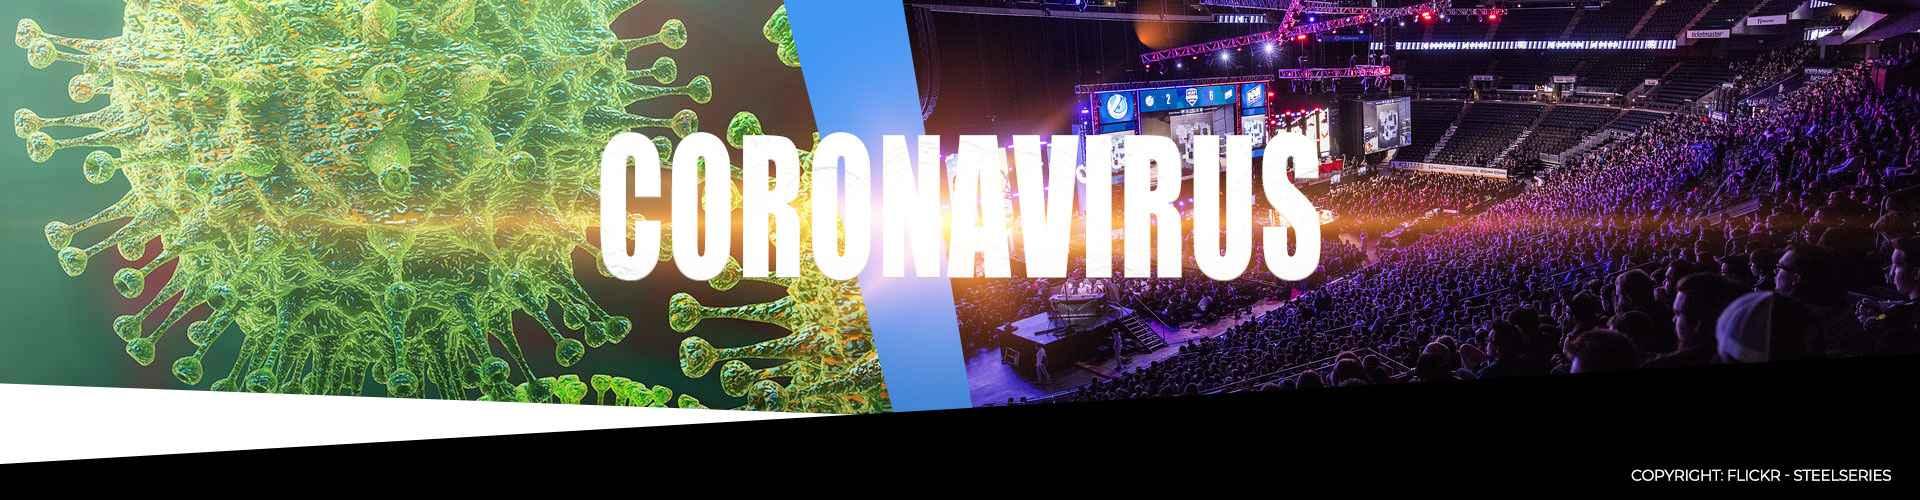 Coronaviruset COVID-19 stoppar flera stora e-sportsturneringar.